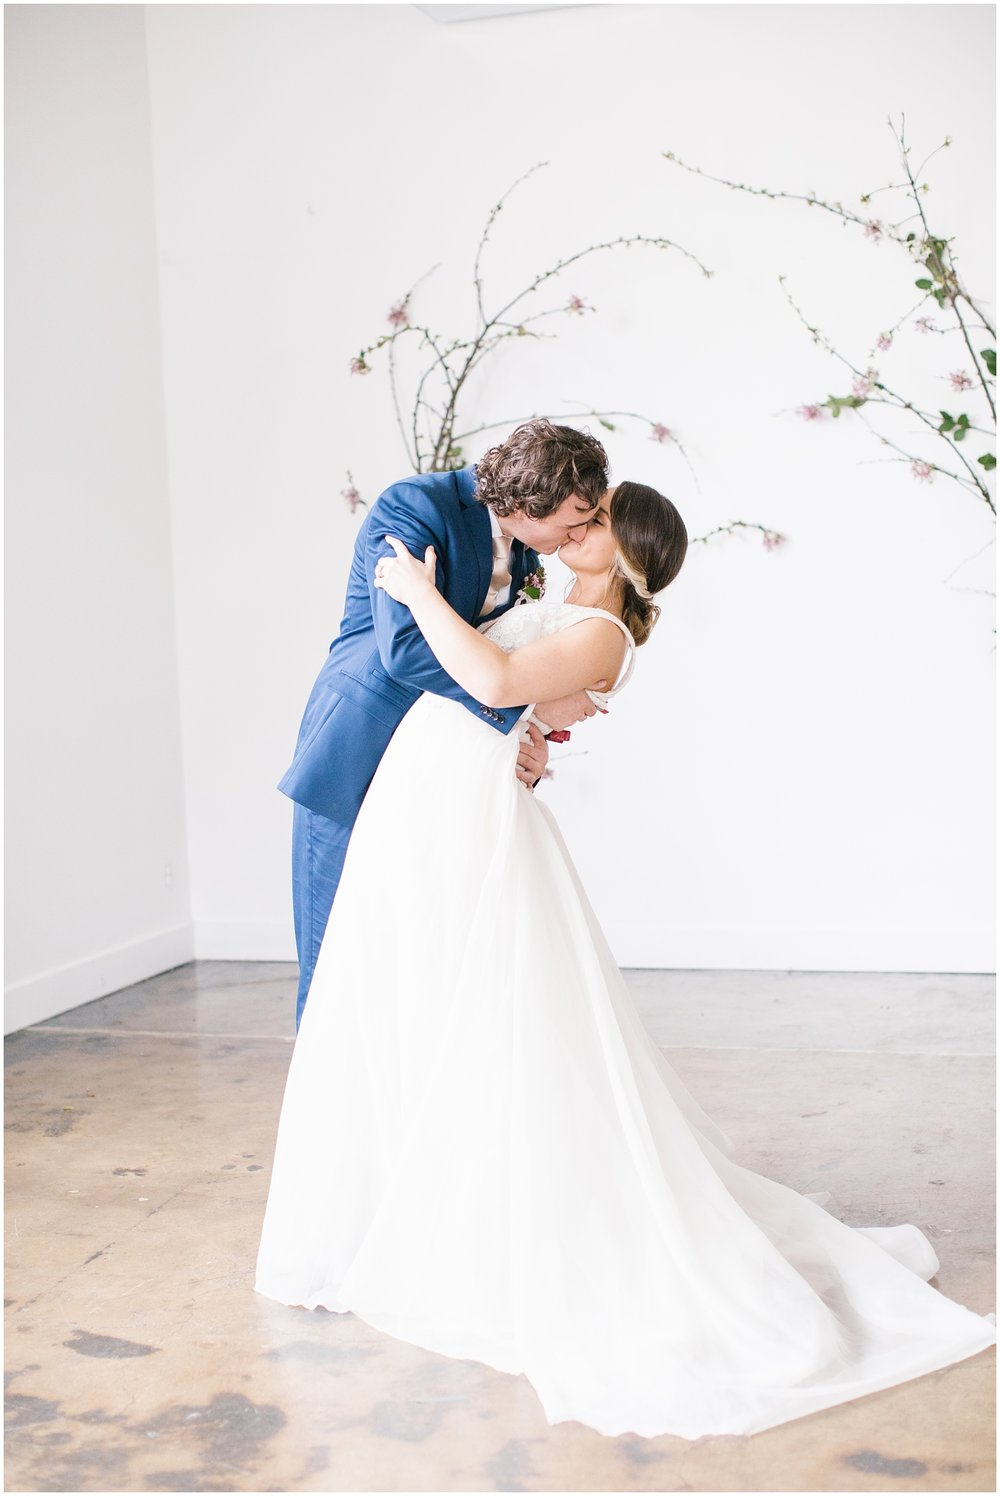 Styled Shoot2-17-16_Lizzie-B-Imagery-Utah-Wedding-Photographer-Park-City-Salt-Lake-City-Charcoal-Loft-Studio.jpg